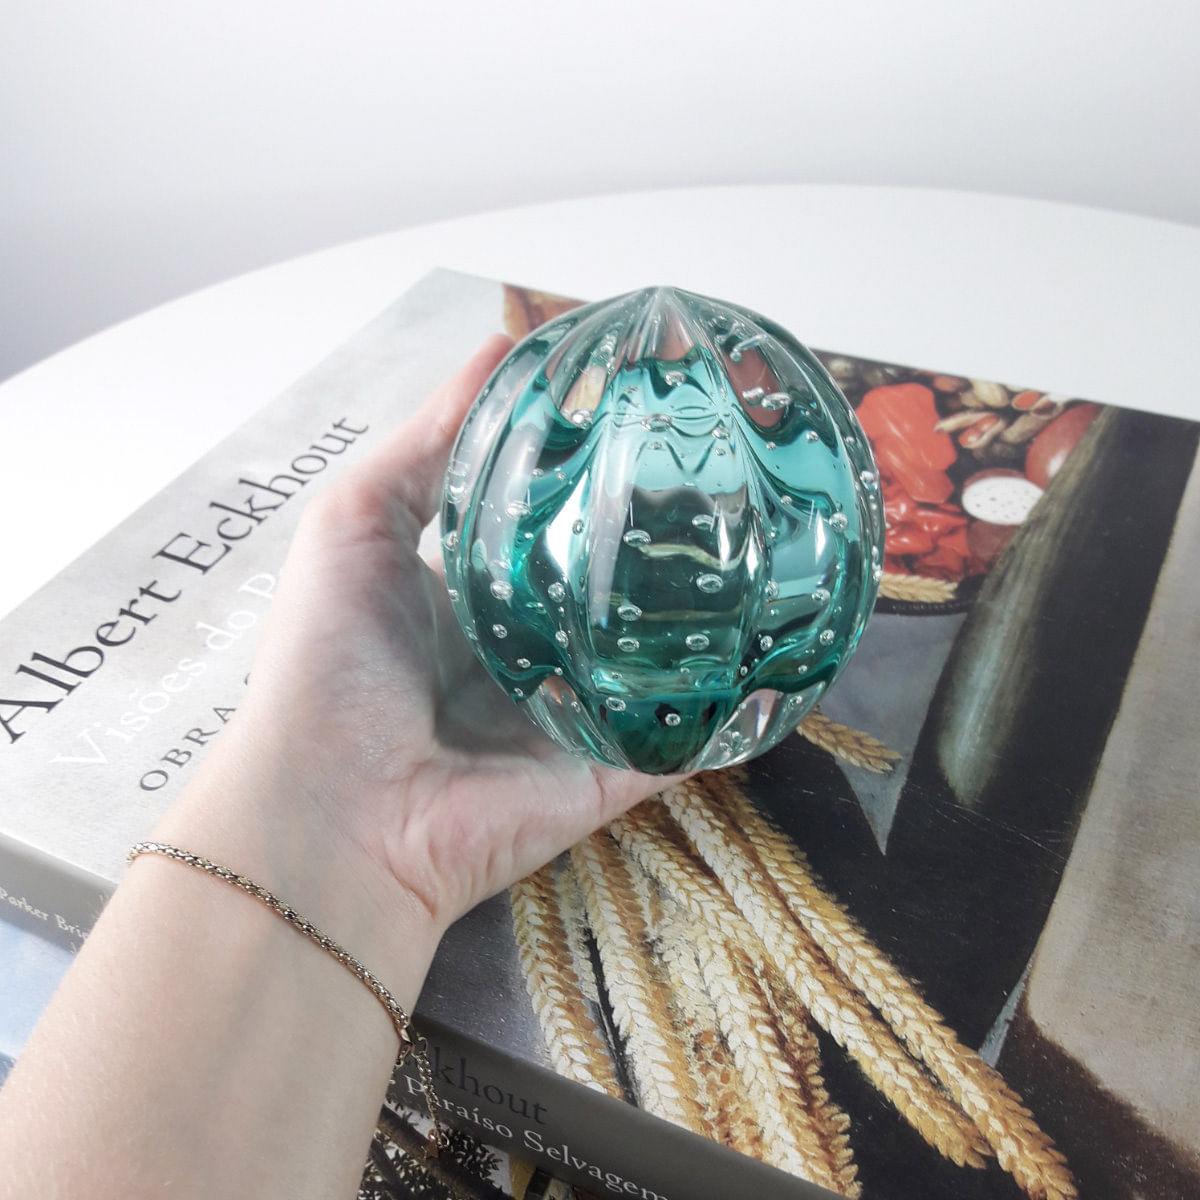 Peso de Cristal Murano D'labone - Cristal Esmeralda Senna 8cm